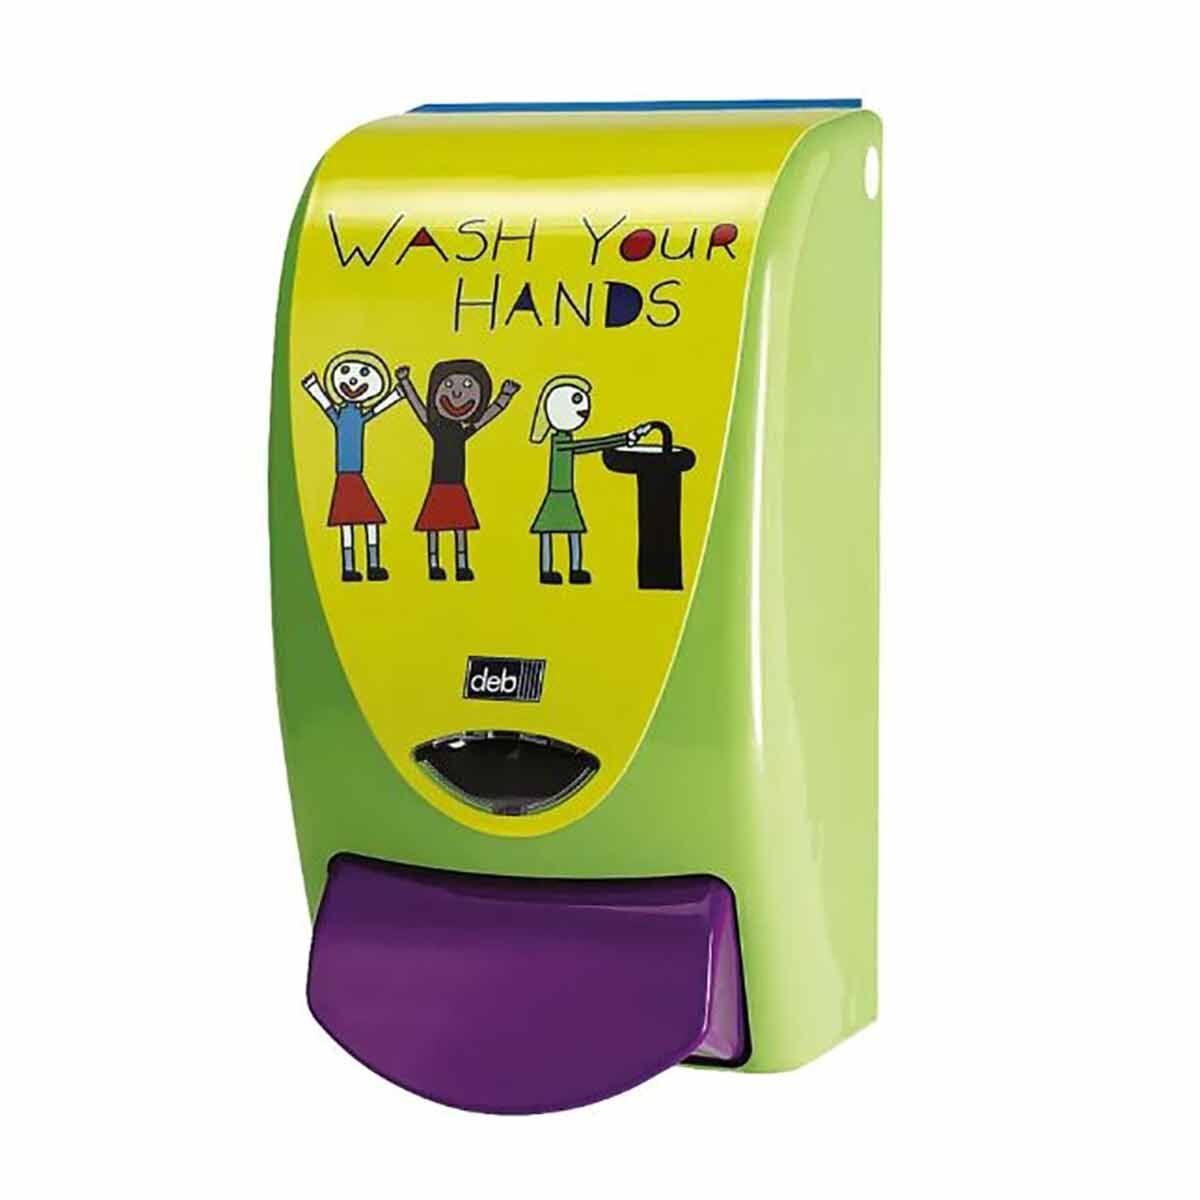 Deb Now Wash Your Hands Foam Wash 1000 Dispenser 1 Litre Capacity